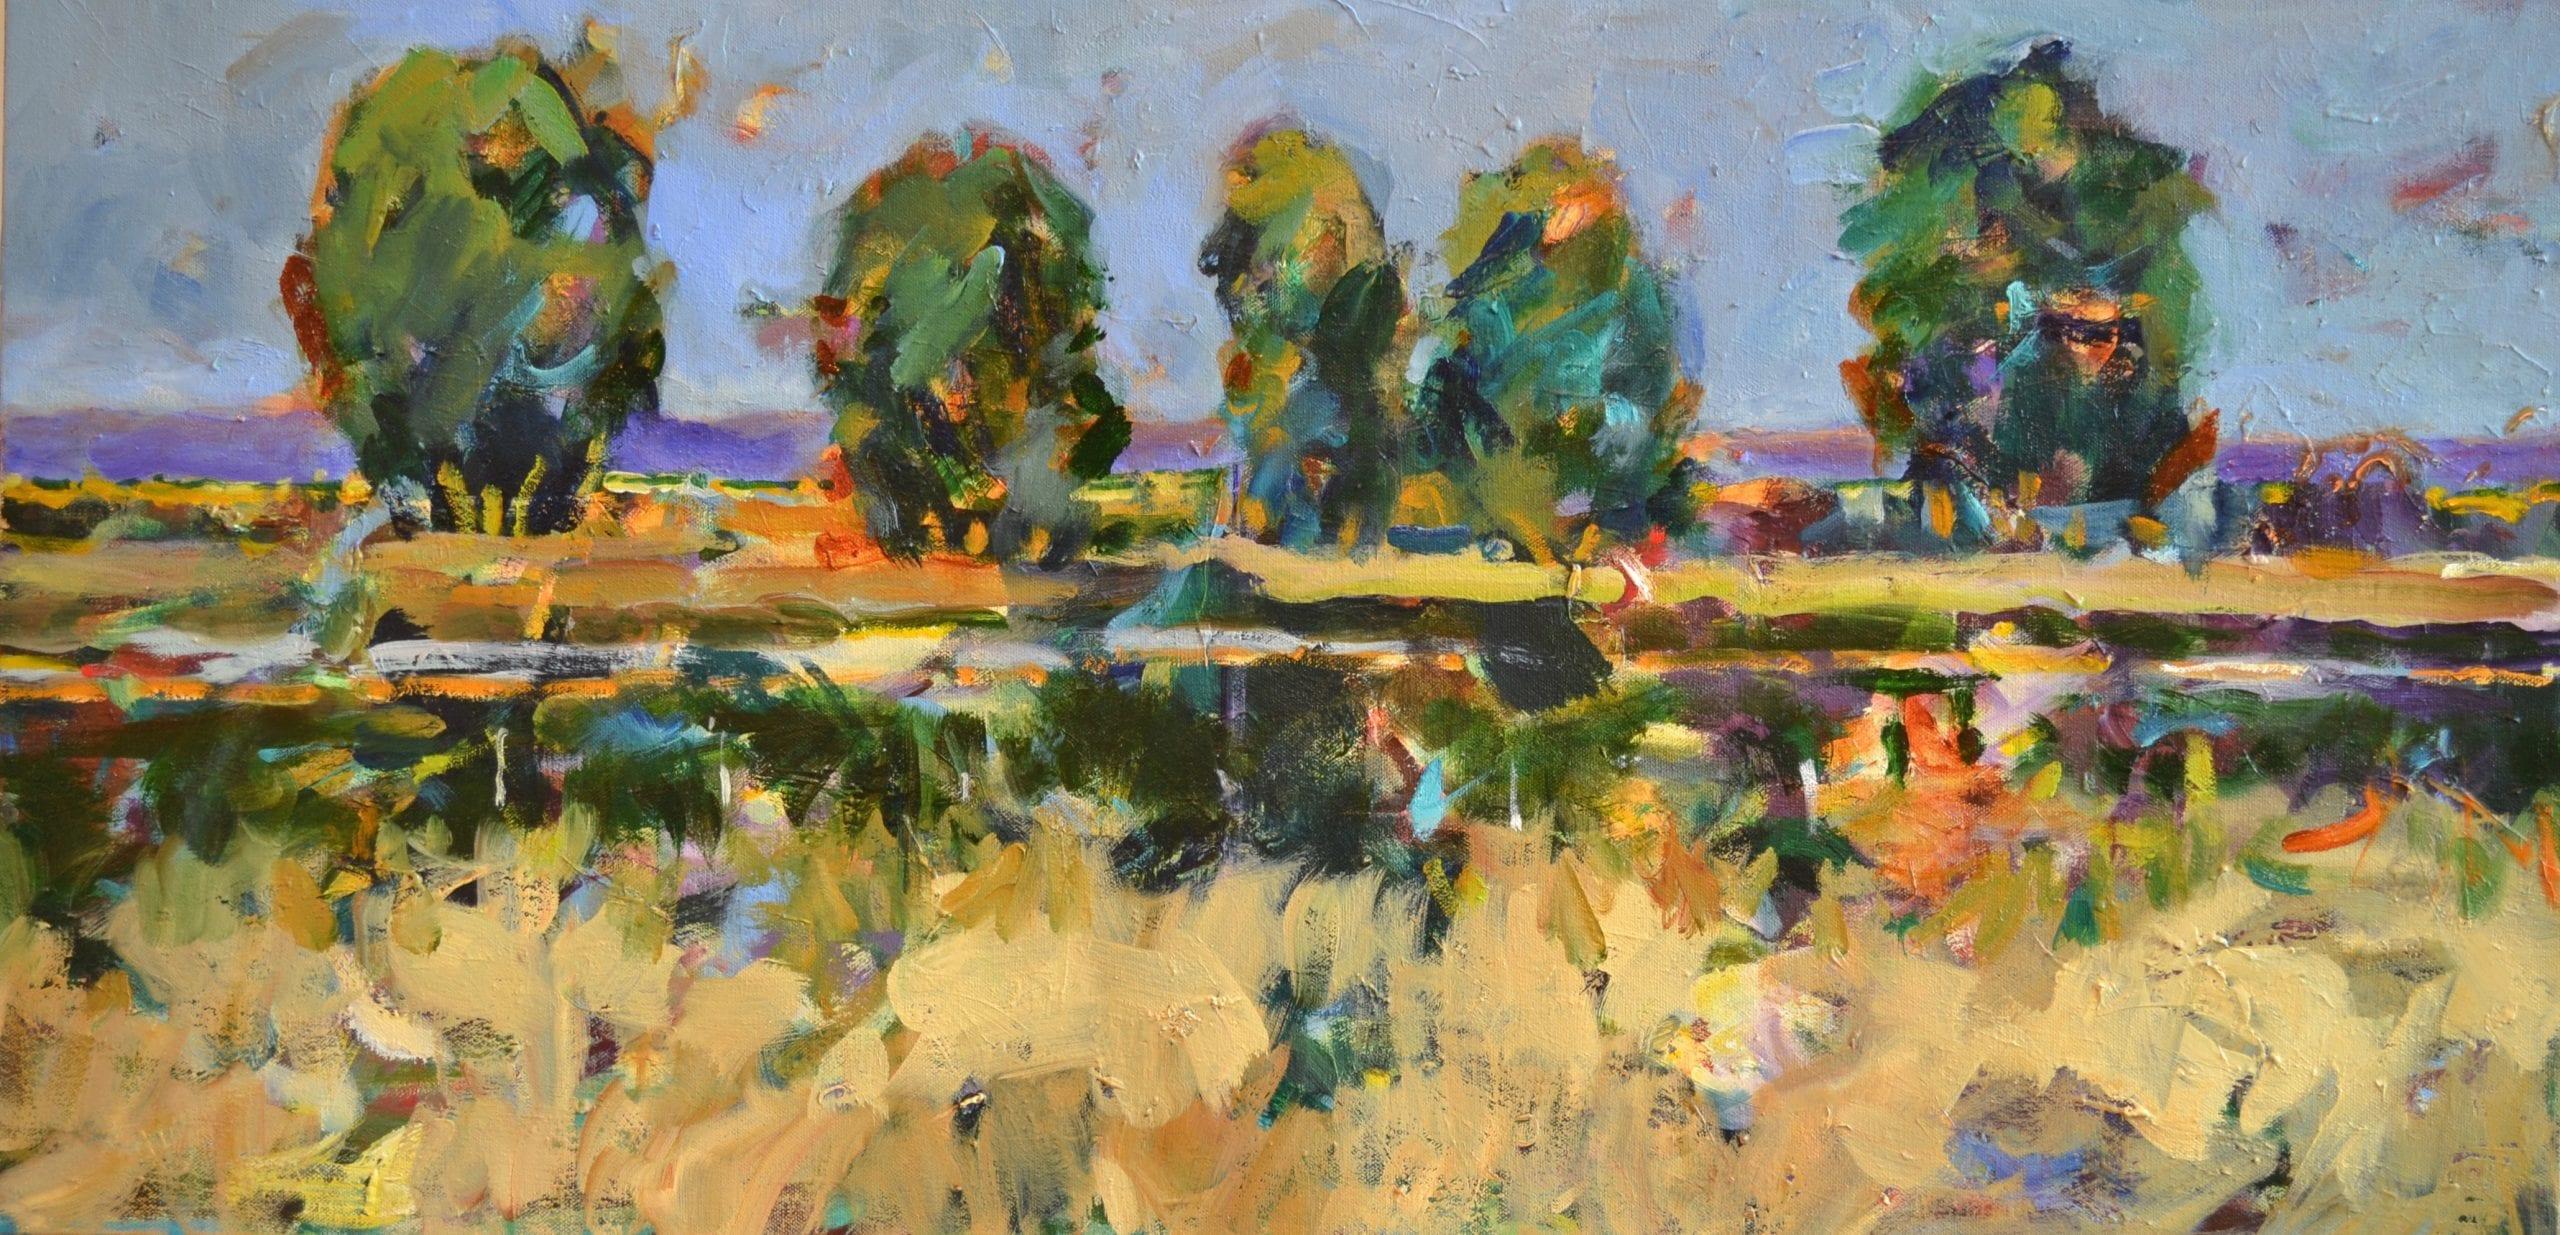 "Pat Mahony - Long Shadow - 2020 - Oil on Canvas - 18"" x 36"""